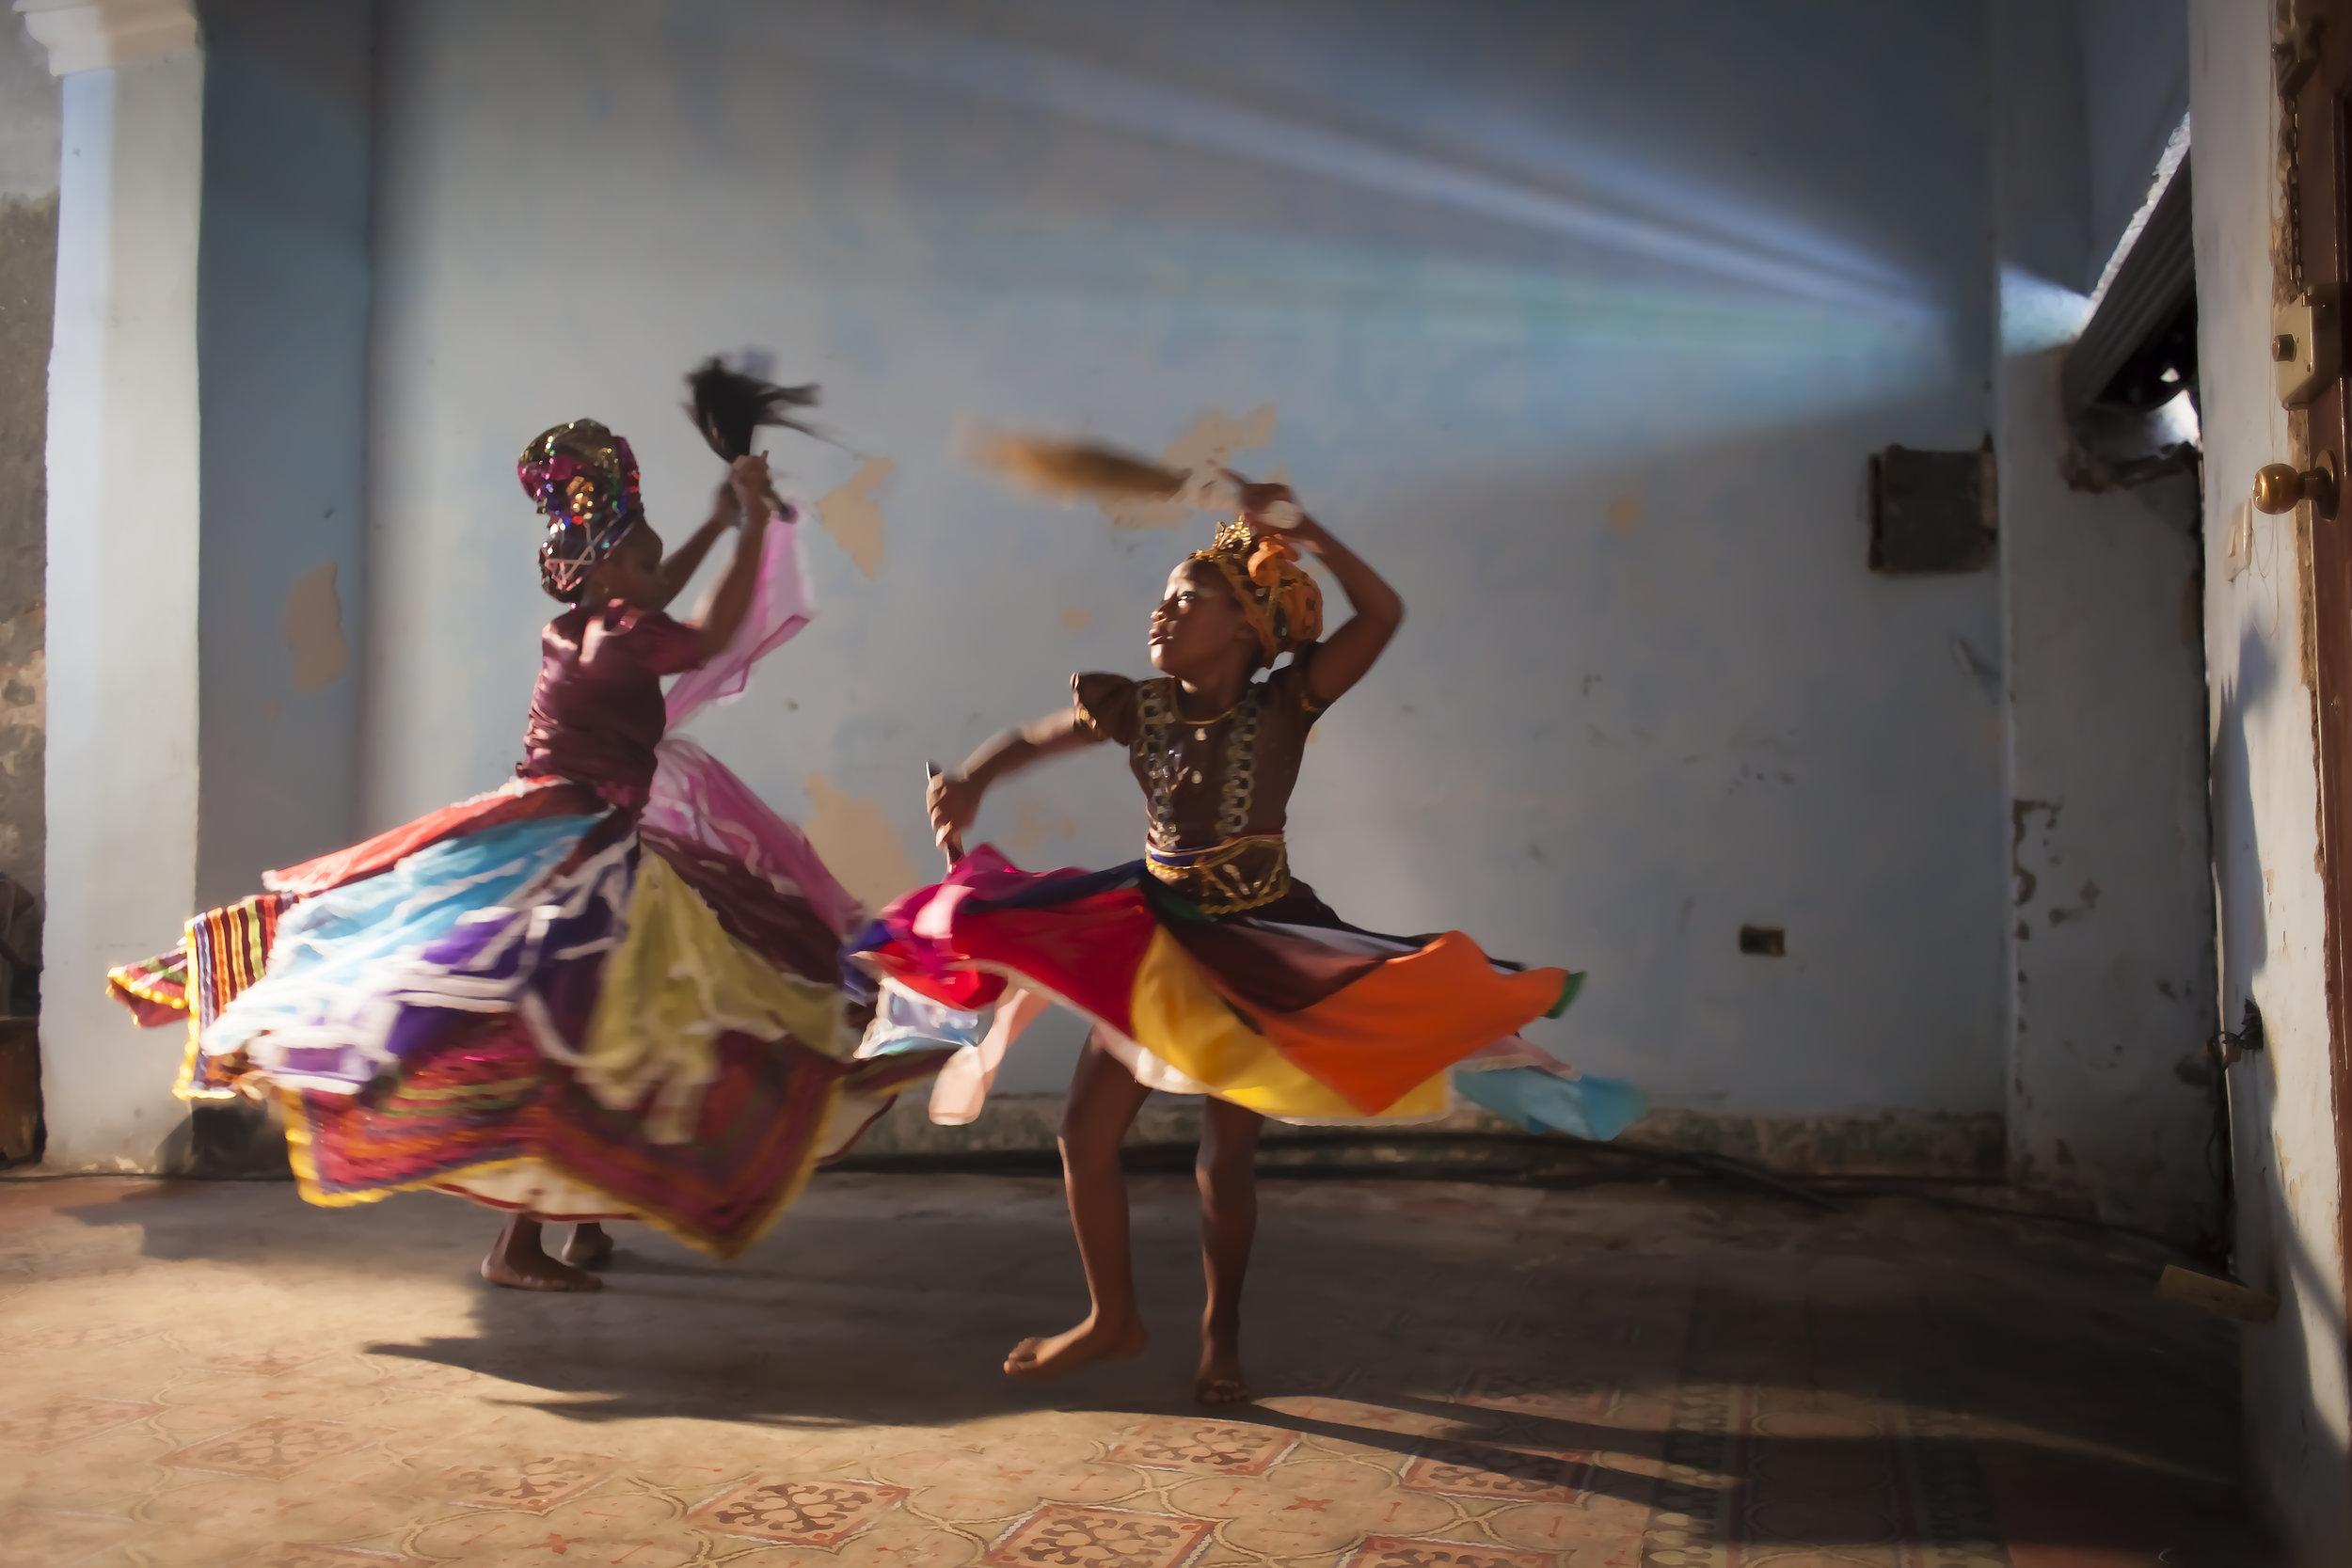 Film still from  Dance With Your Heart  (Tengo Talento Cuba)(United States, 2017)10:21,Director: Eli Jacobs-Fantauzzi